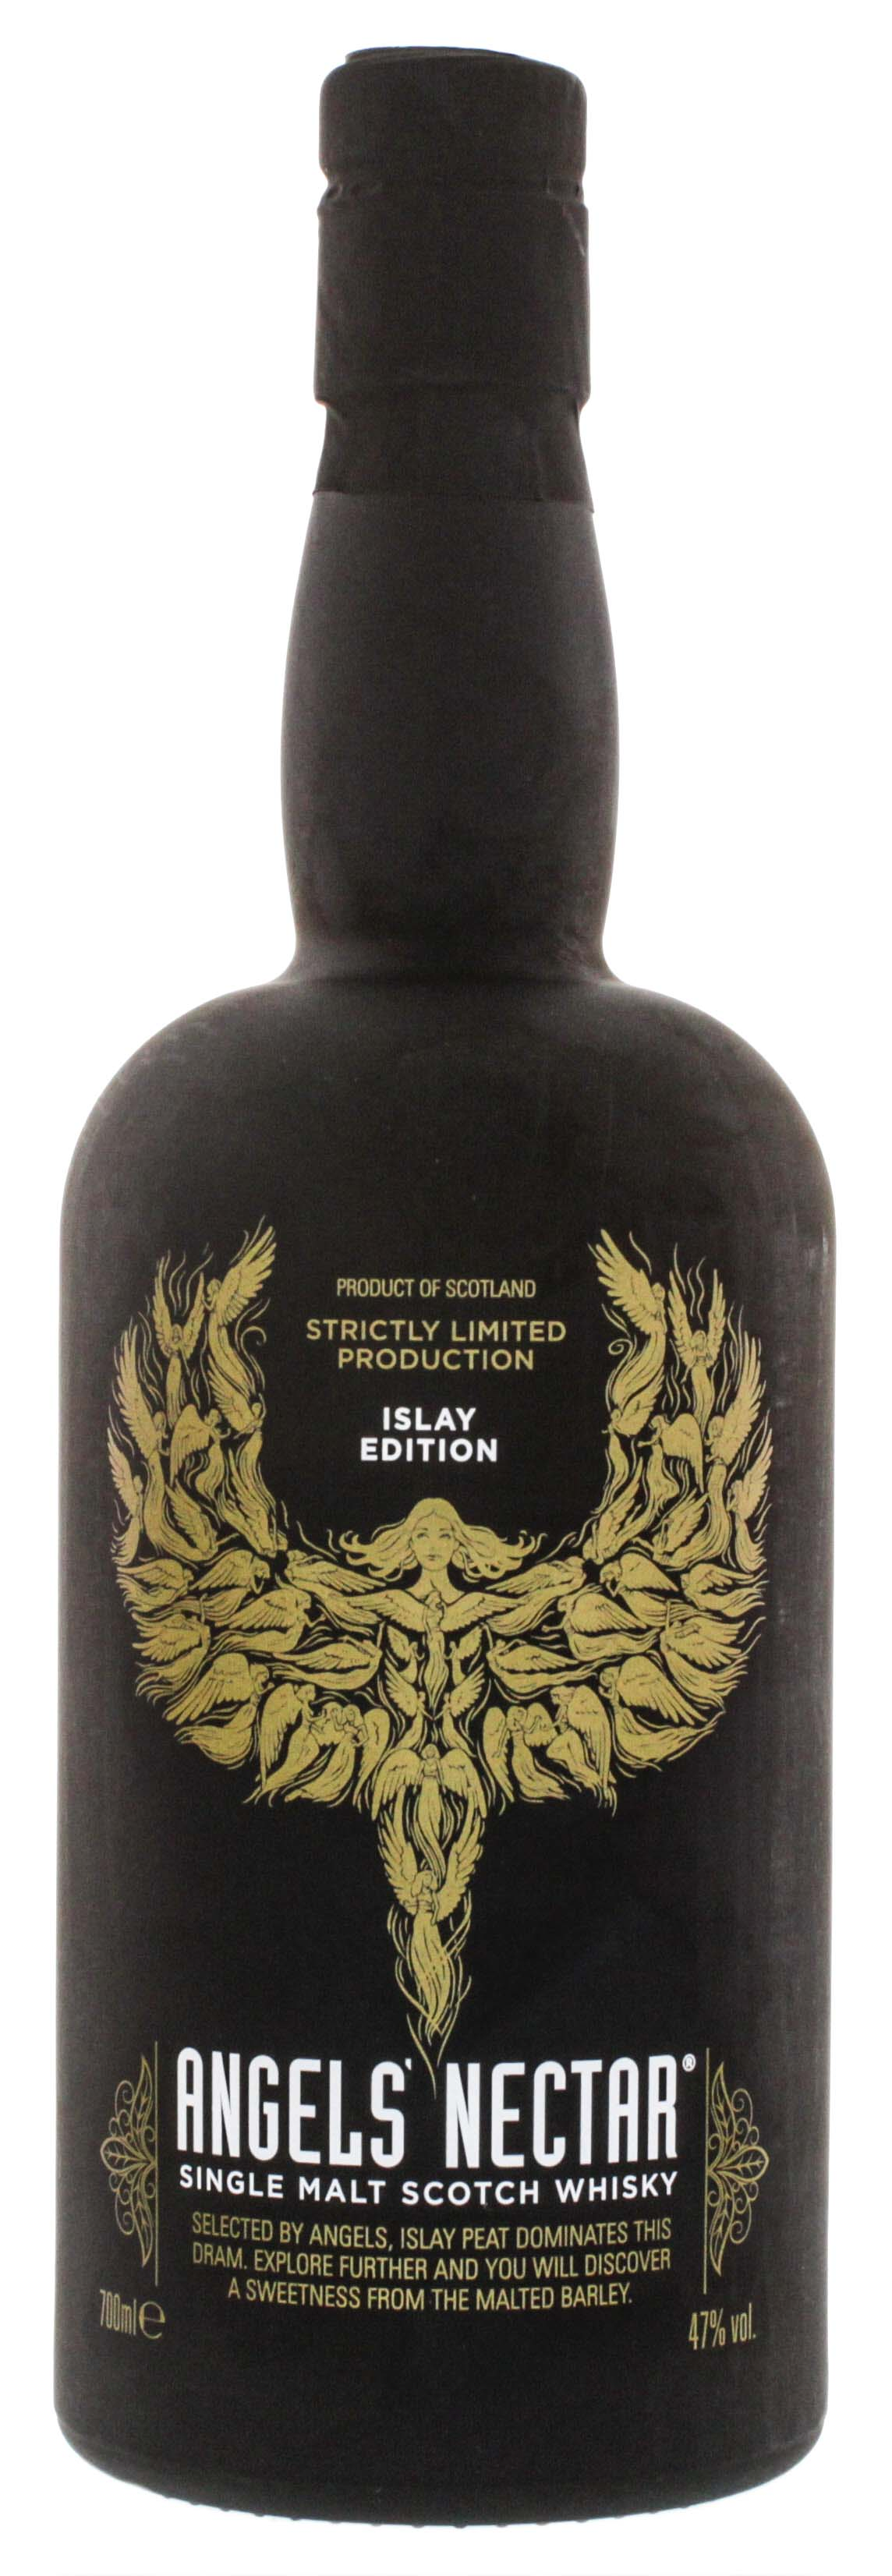 Angels Nectar Single Malt Scotch Whisky Islay Edition 0,7L